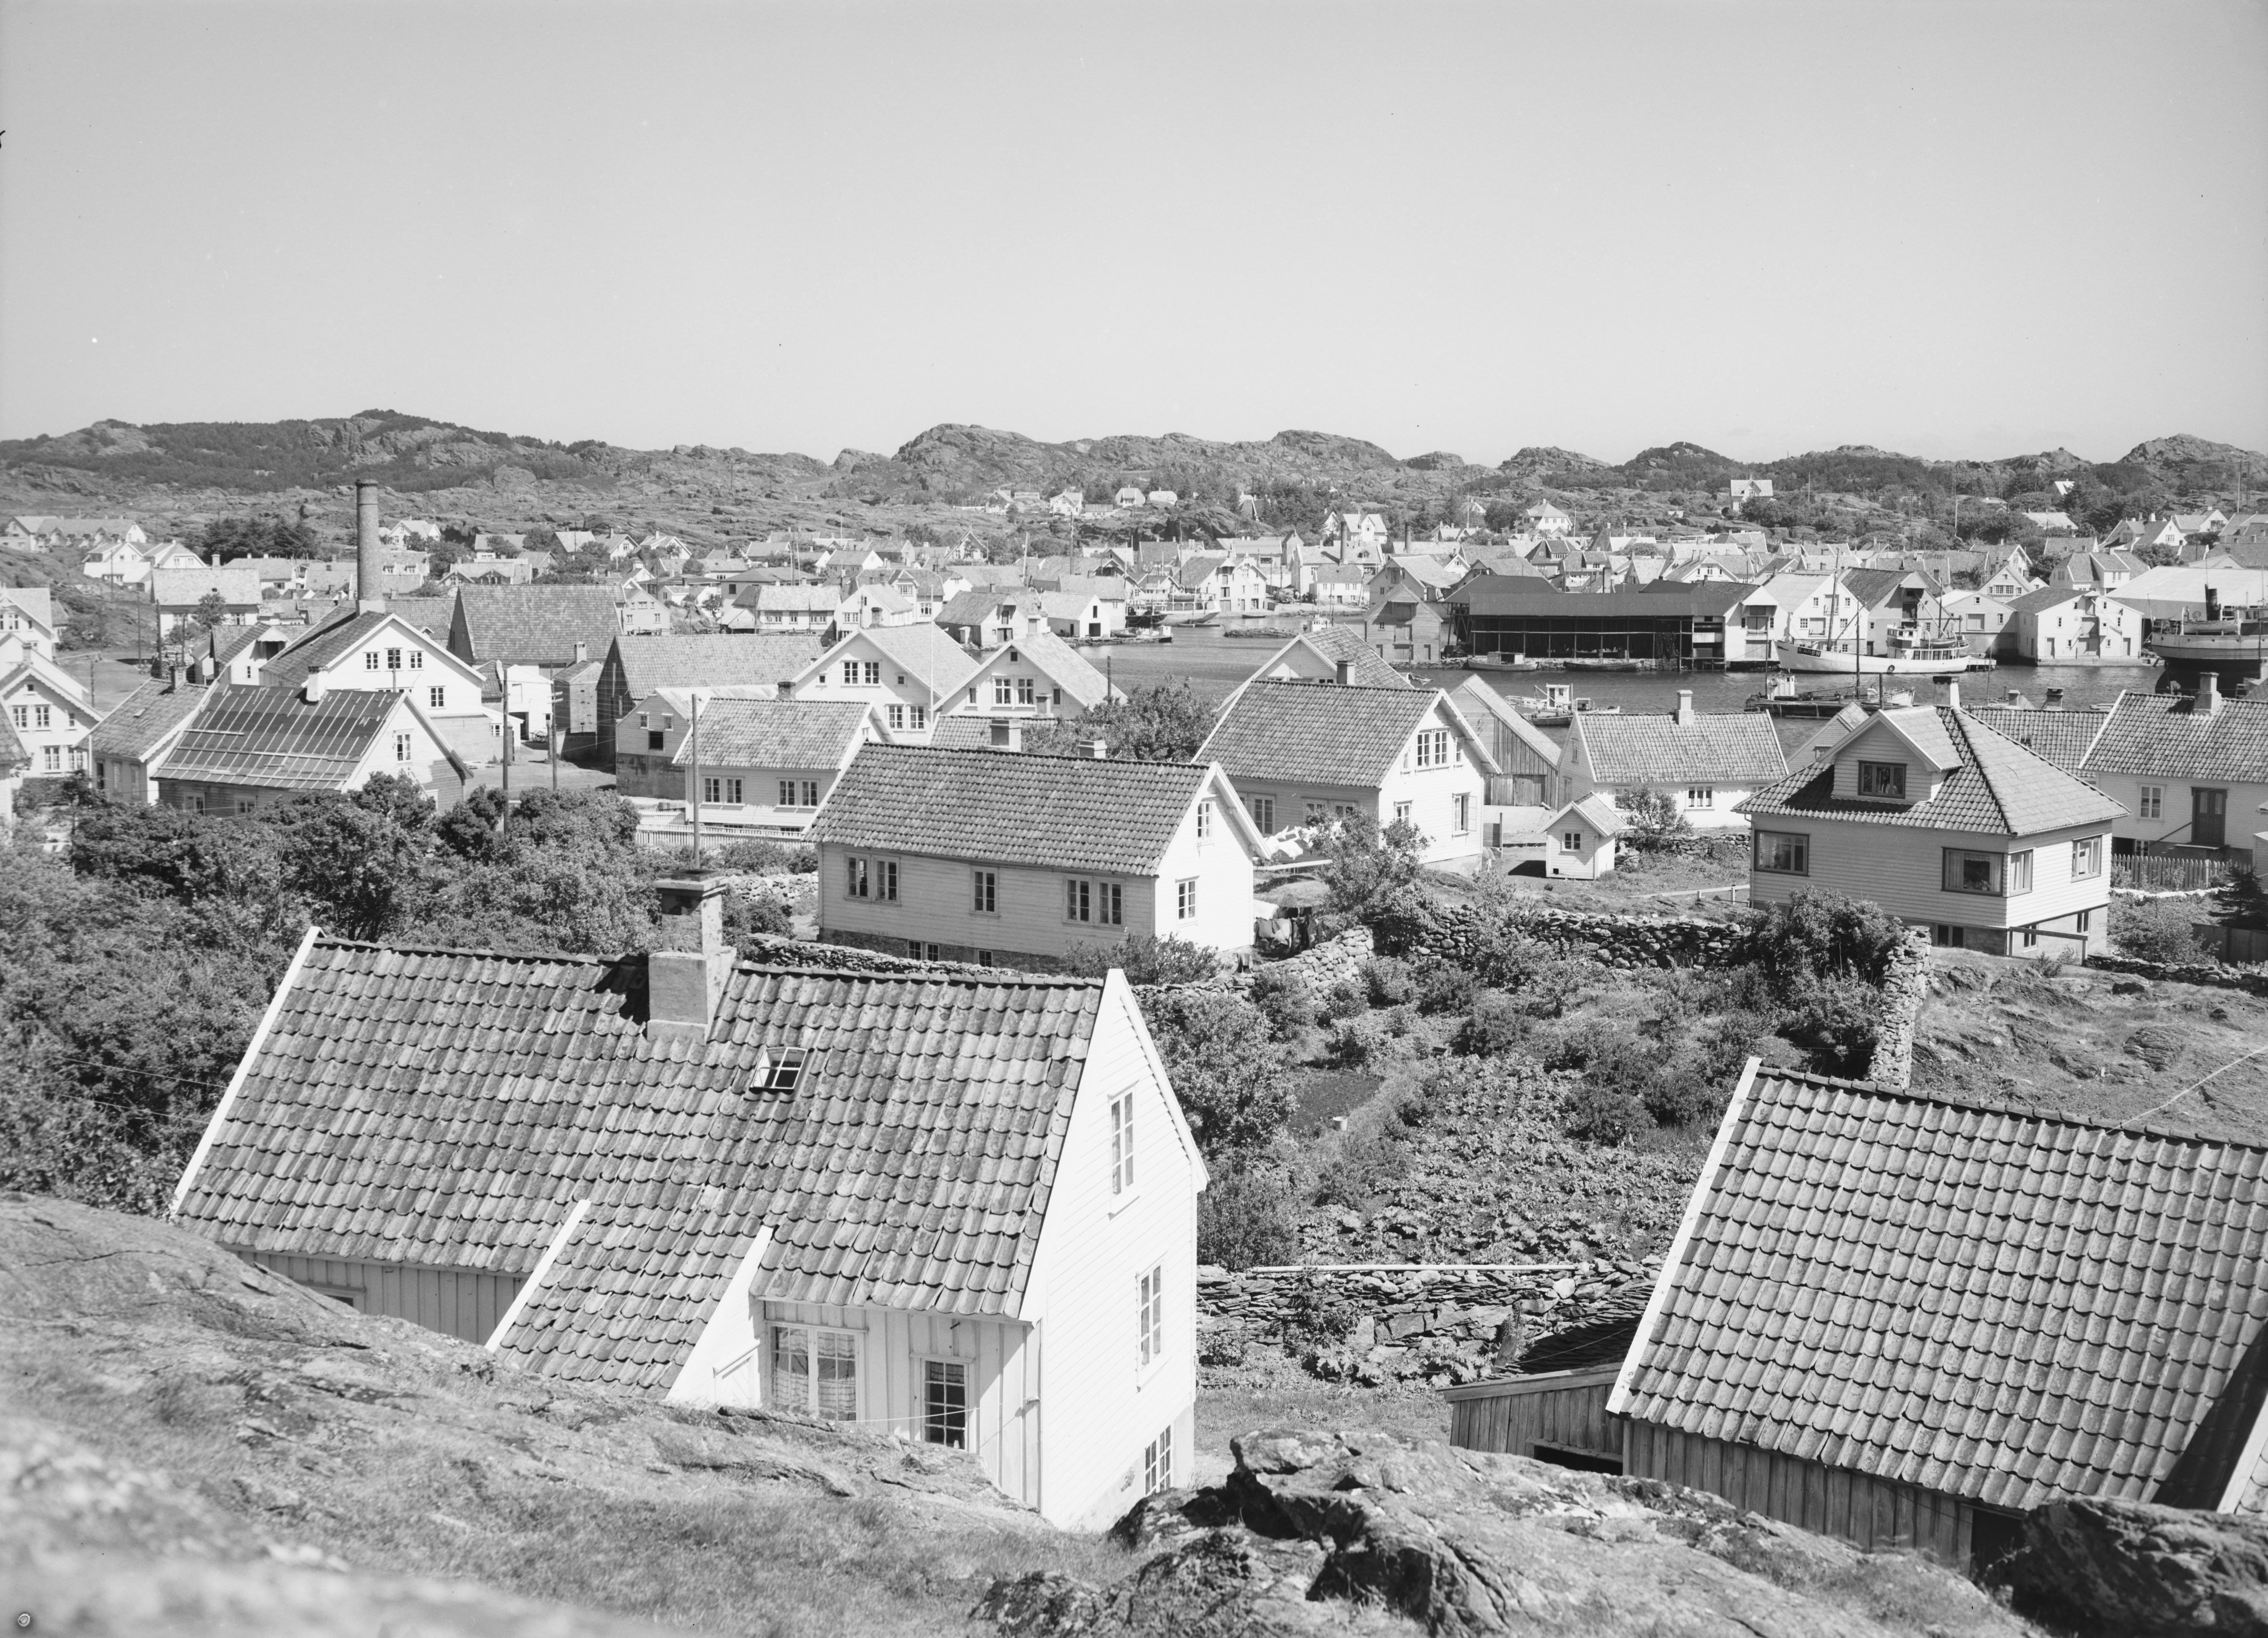 kåfjord dating steder hasvik singel